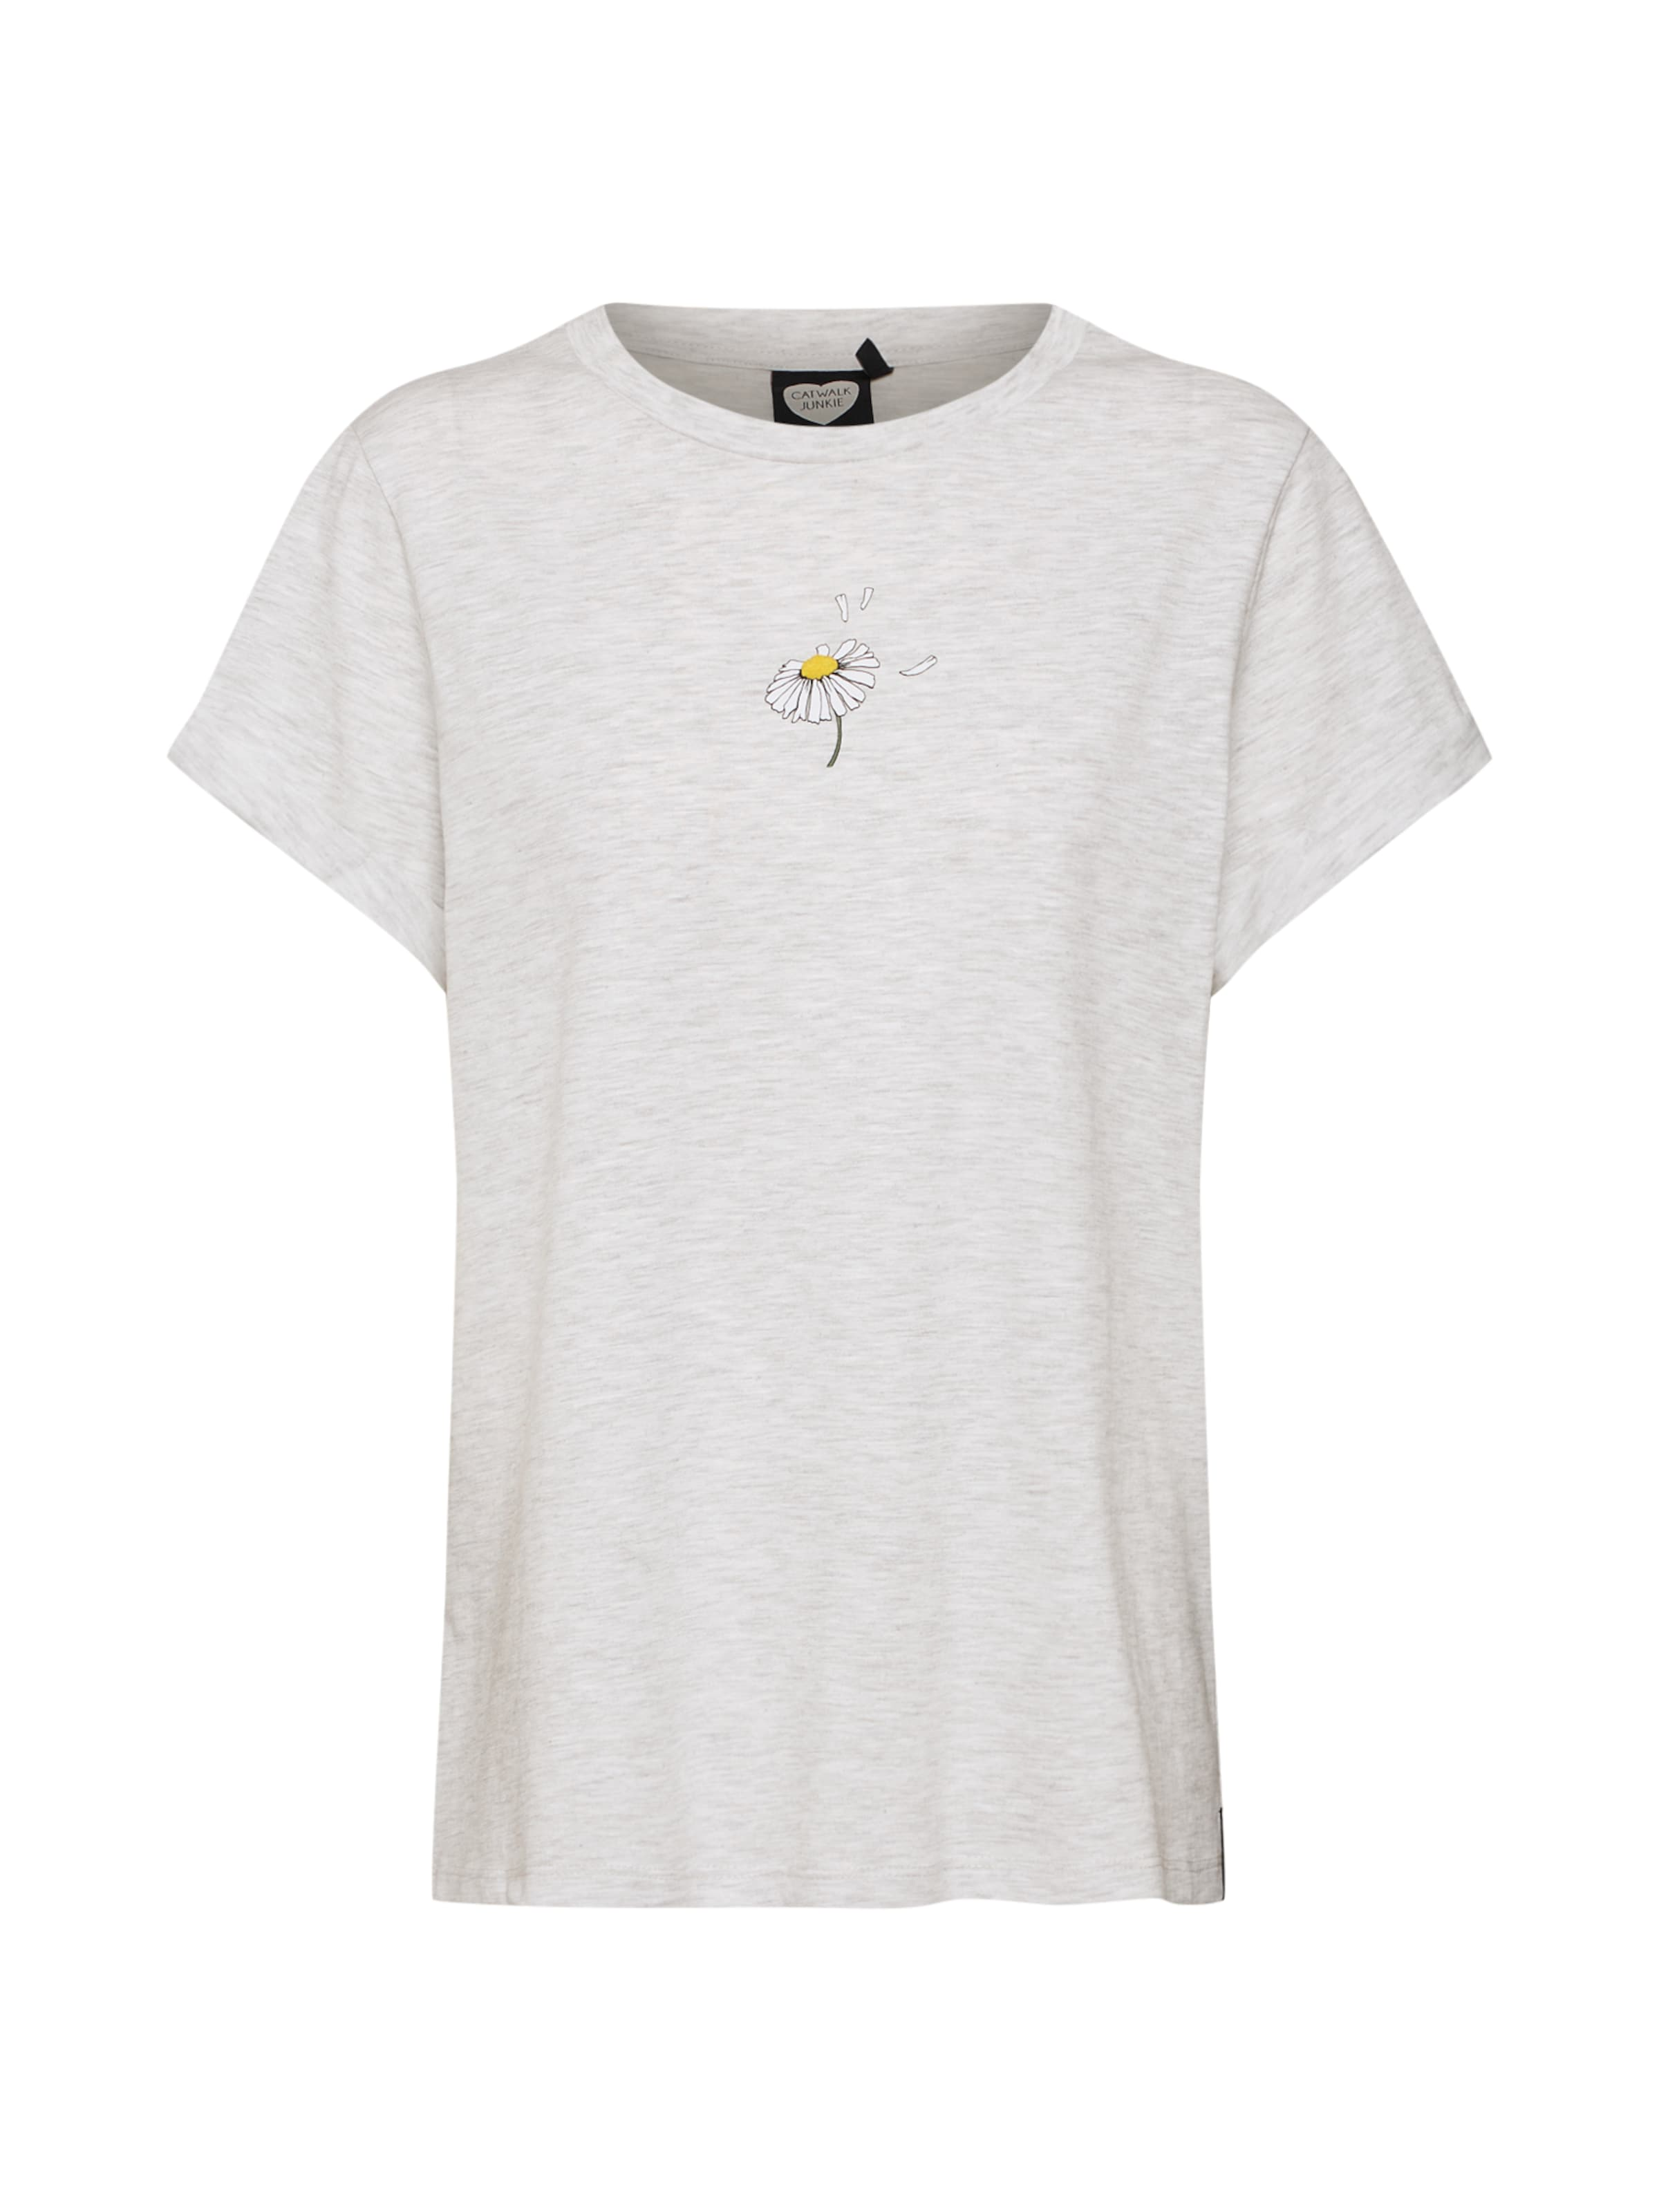 T Chiné Flower' Gris Daisy shirt 'ts En Catwalk Junkie PkiuTOXZ